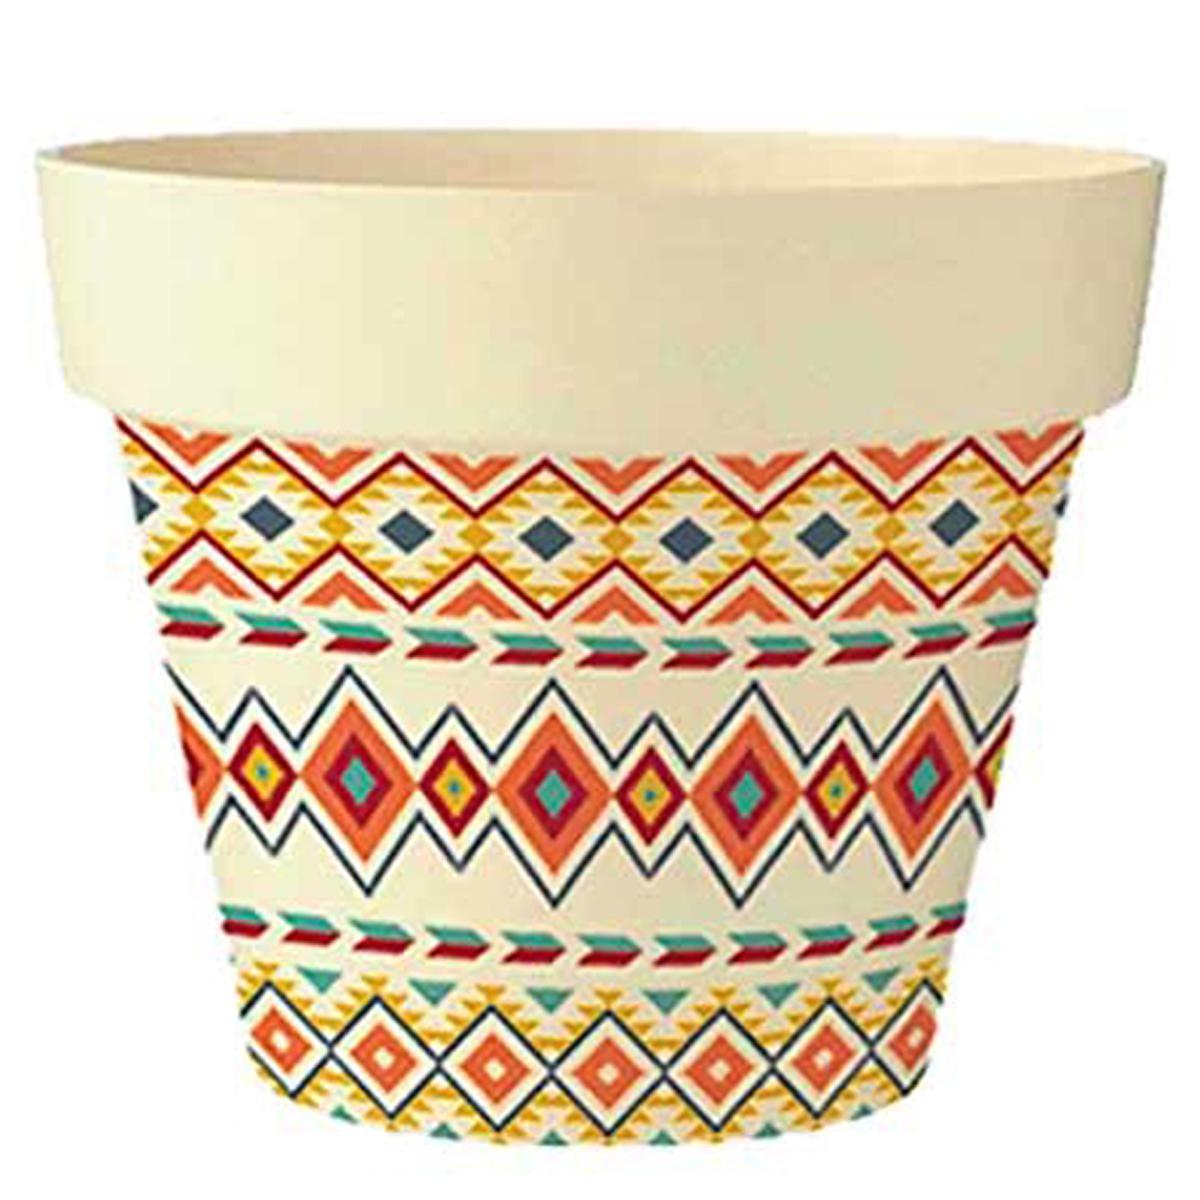 Cache-pot bambou \'Boho\' orange multicolore -  17x18 cm - [Q6588]